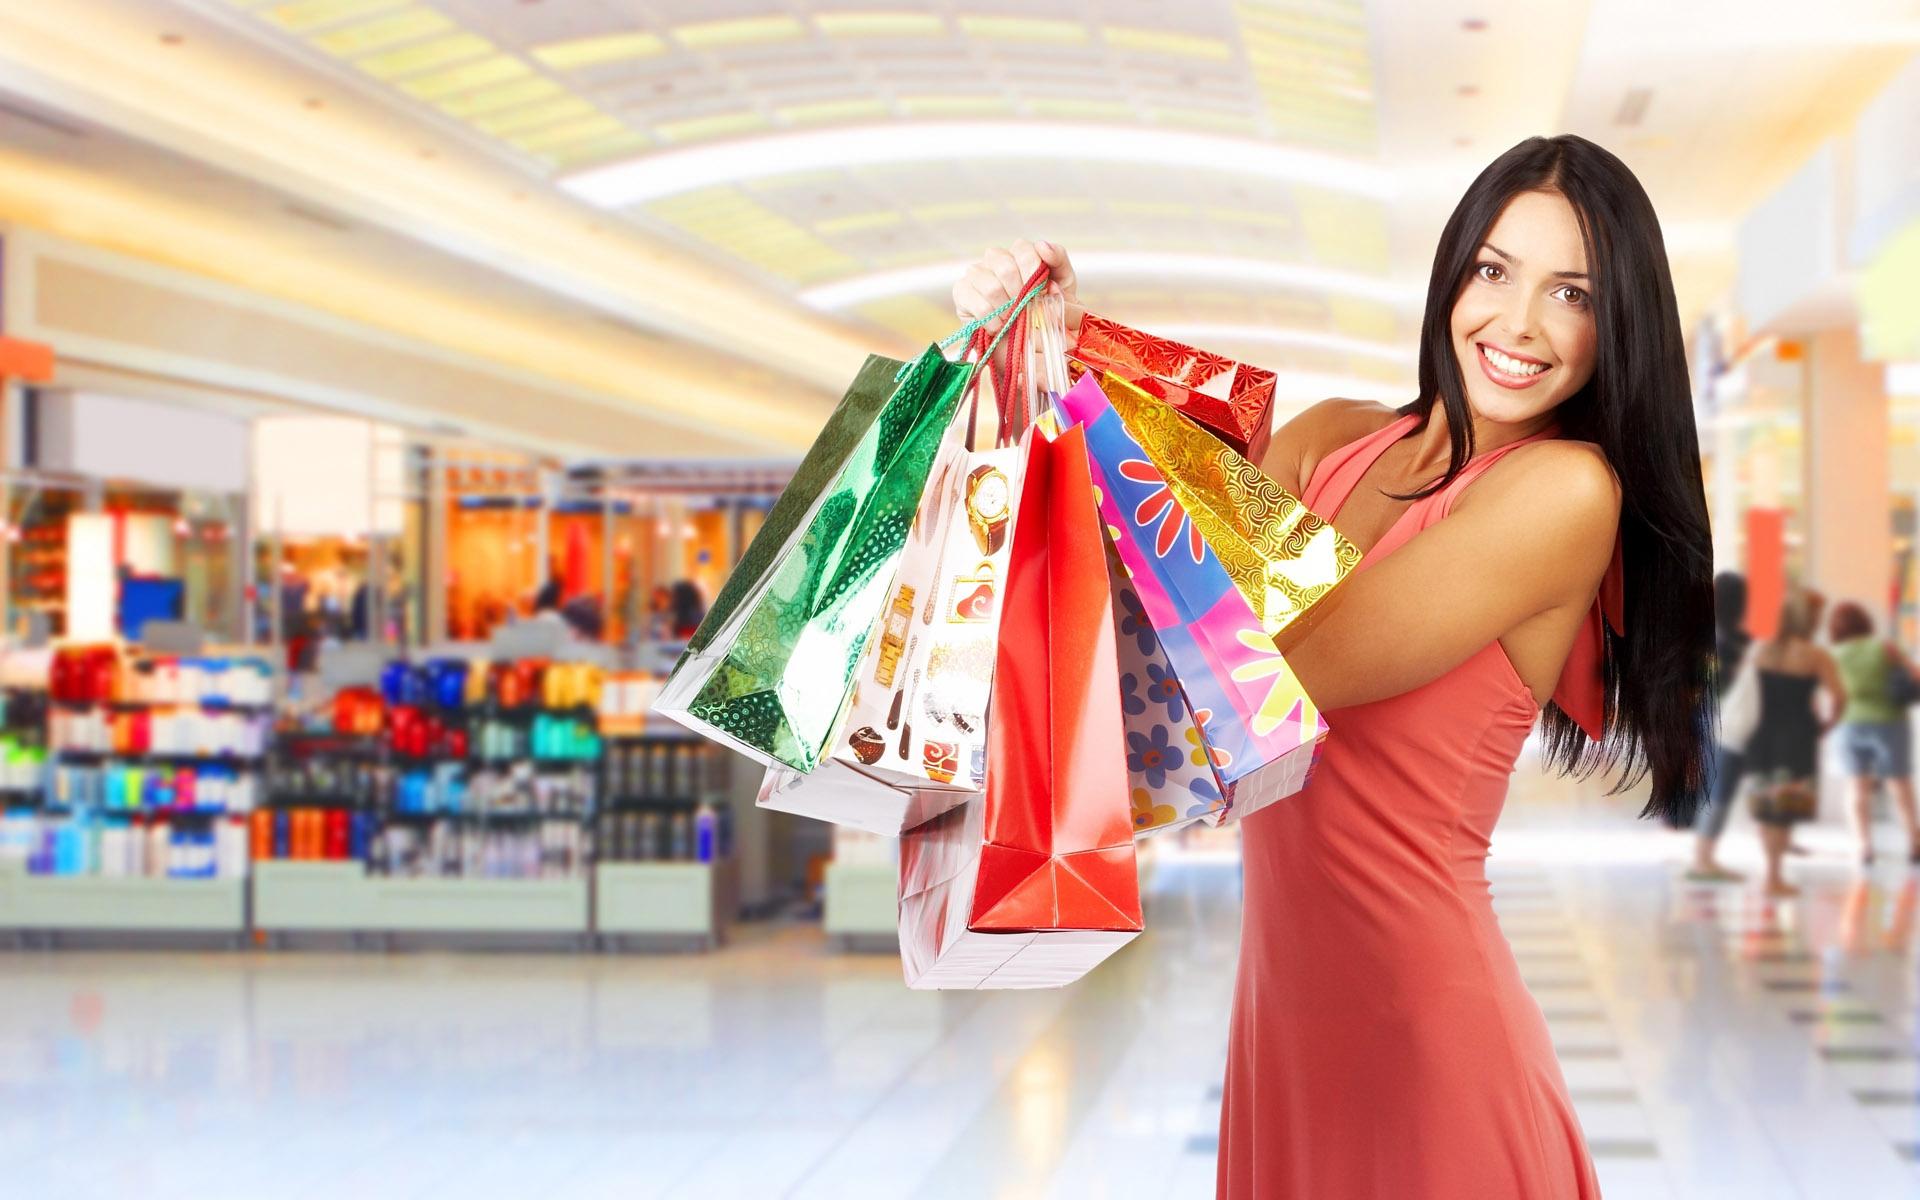 Go Online to Buy Wax Atomizer From a Trustworthy Online Retailer in USA